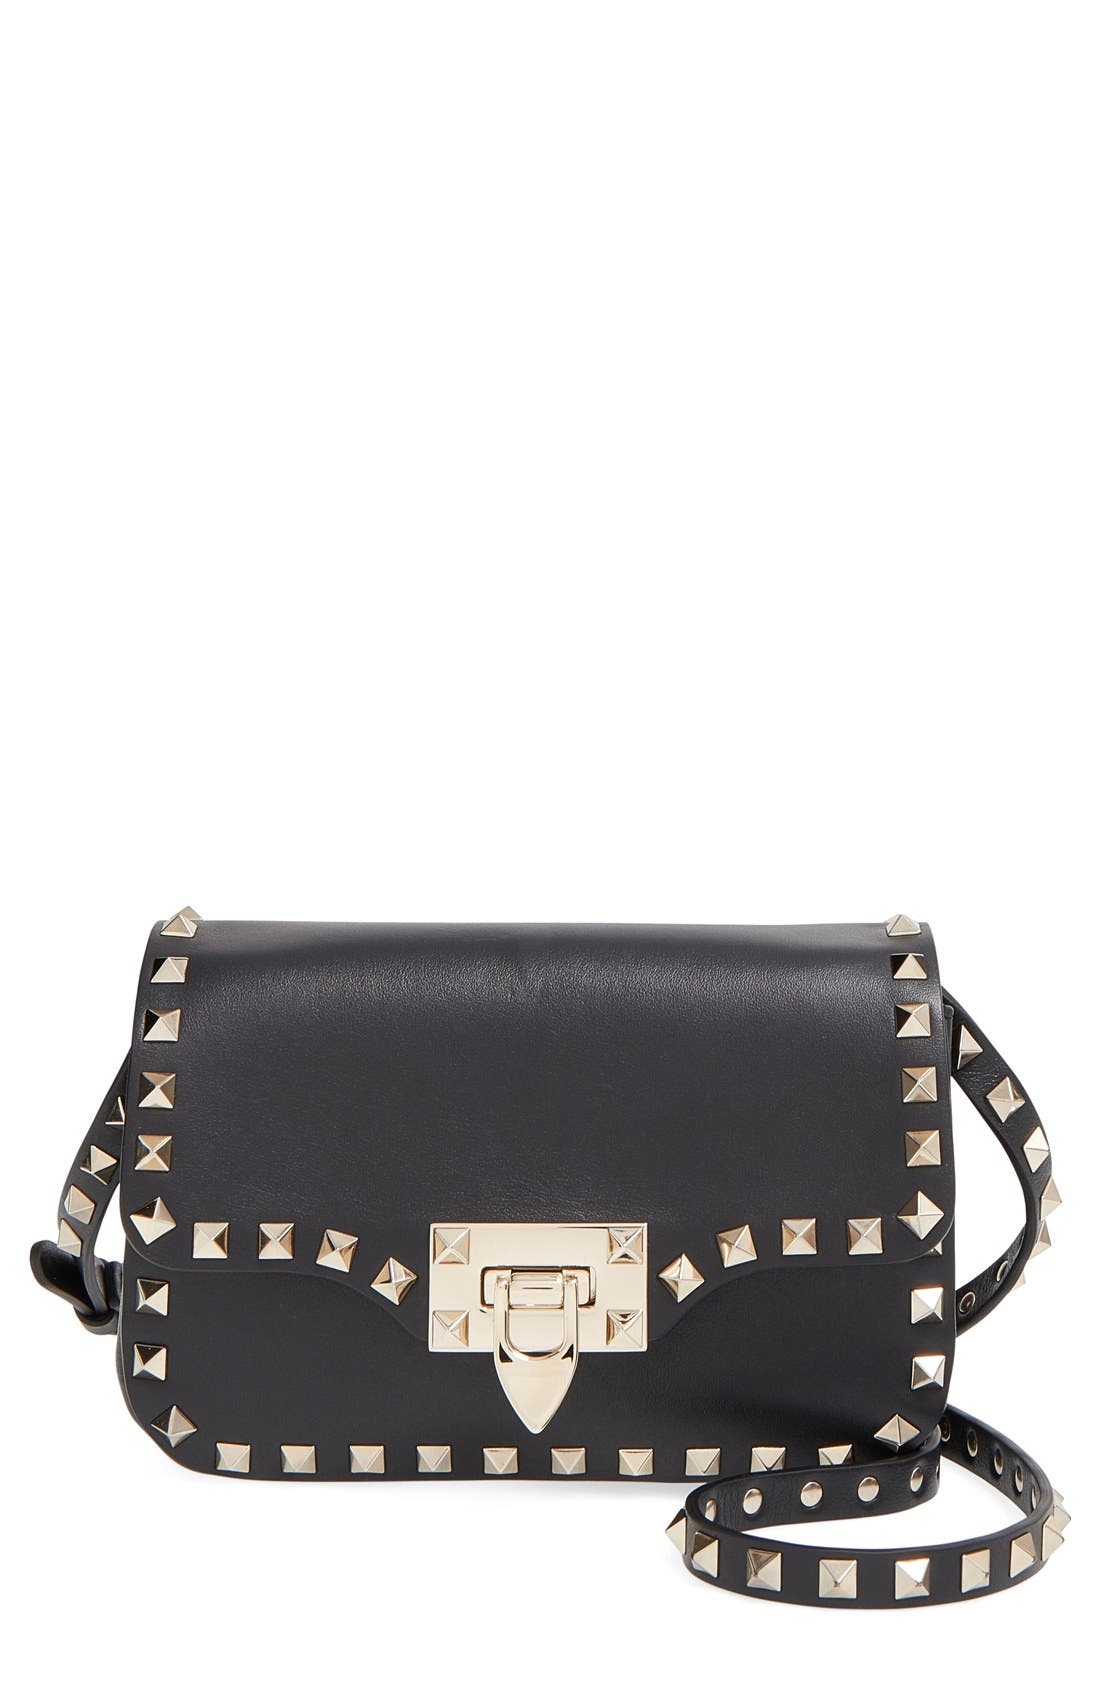 VALENTINO 'Mini Rockstud' Crossbody Bag, Main, color, 001